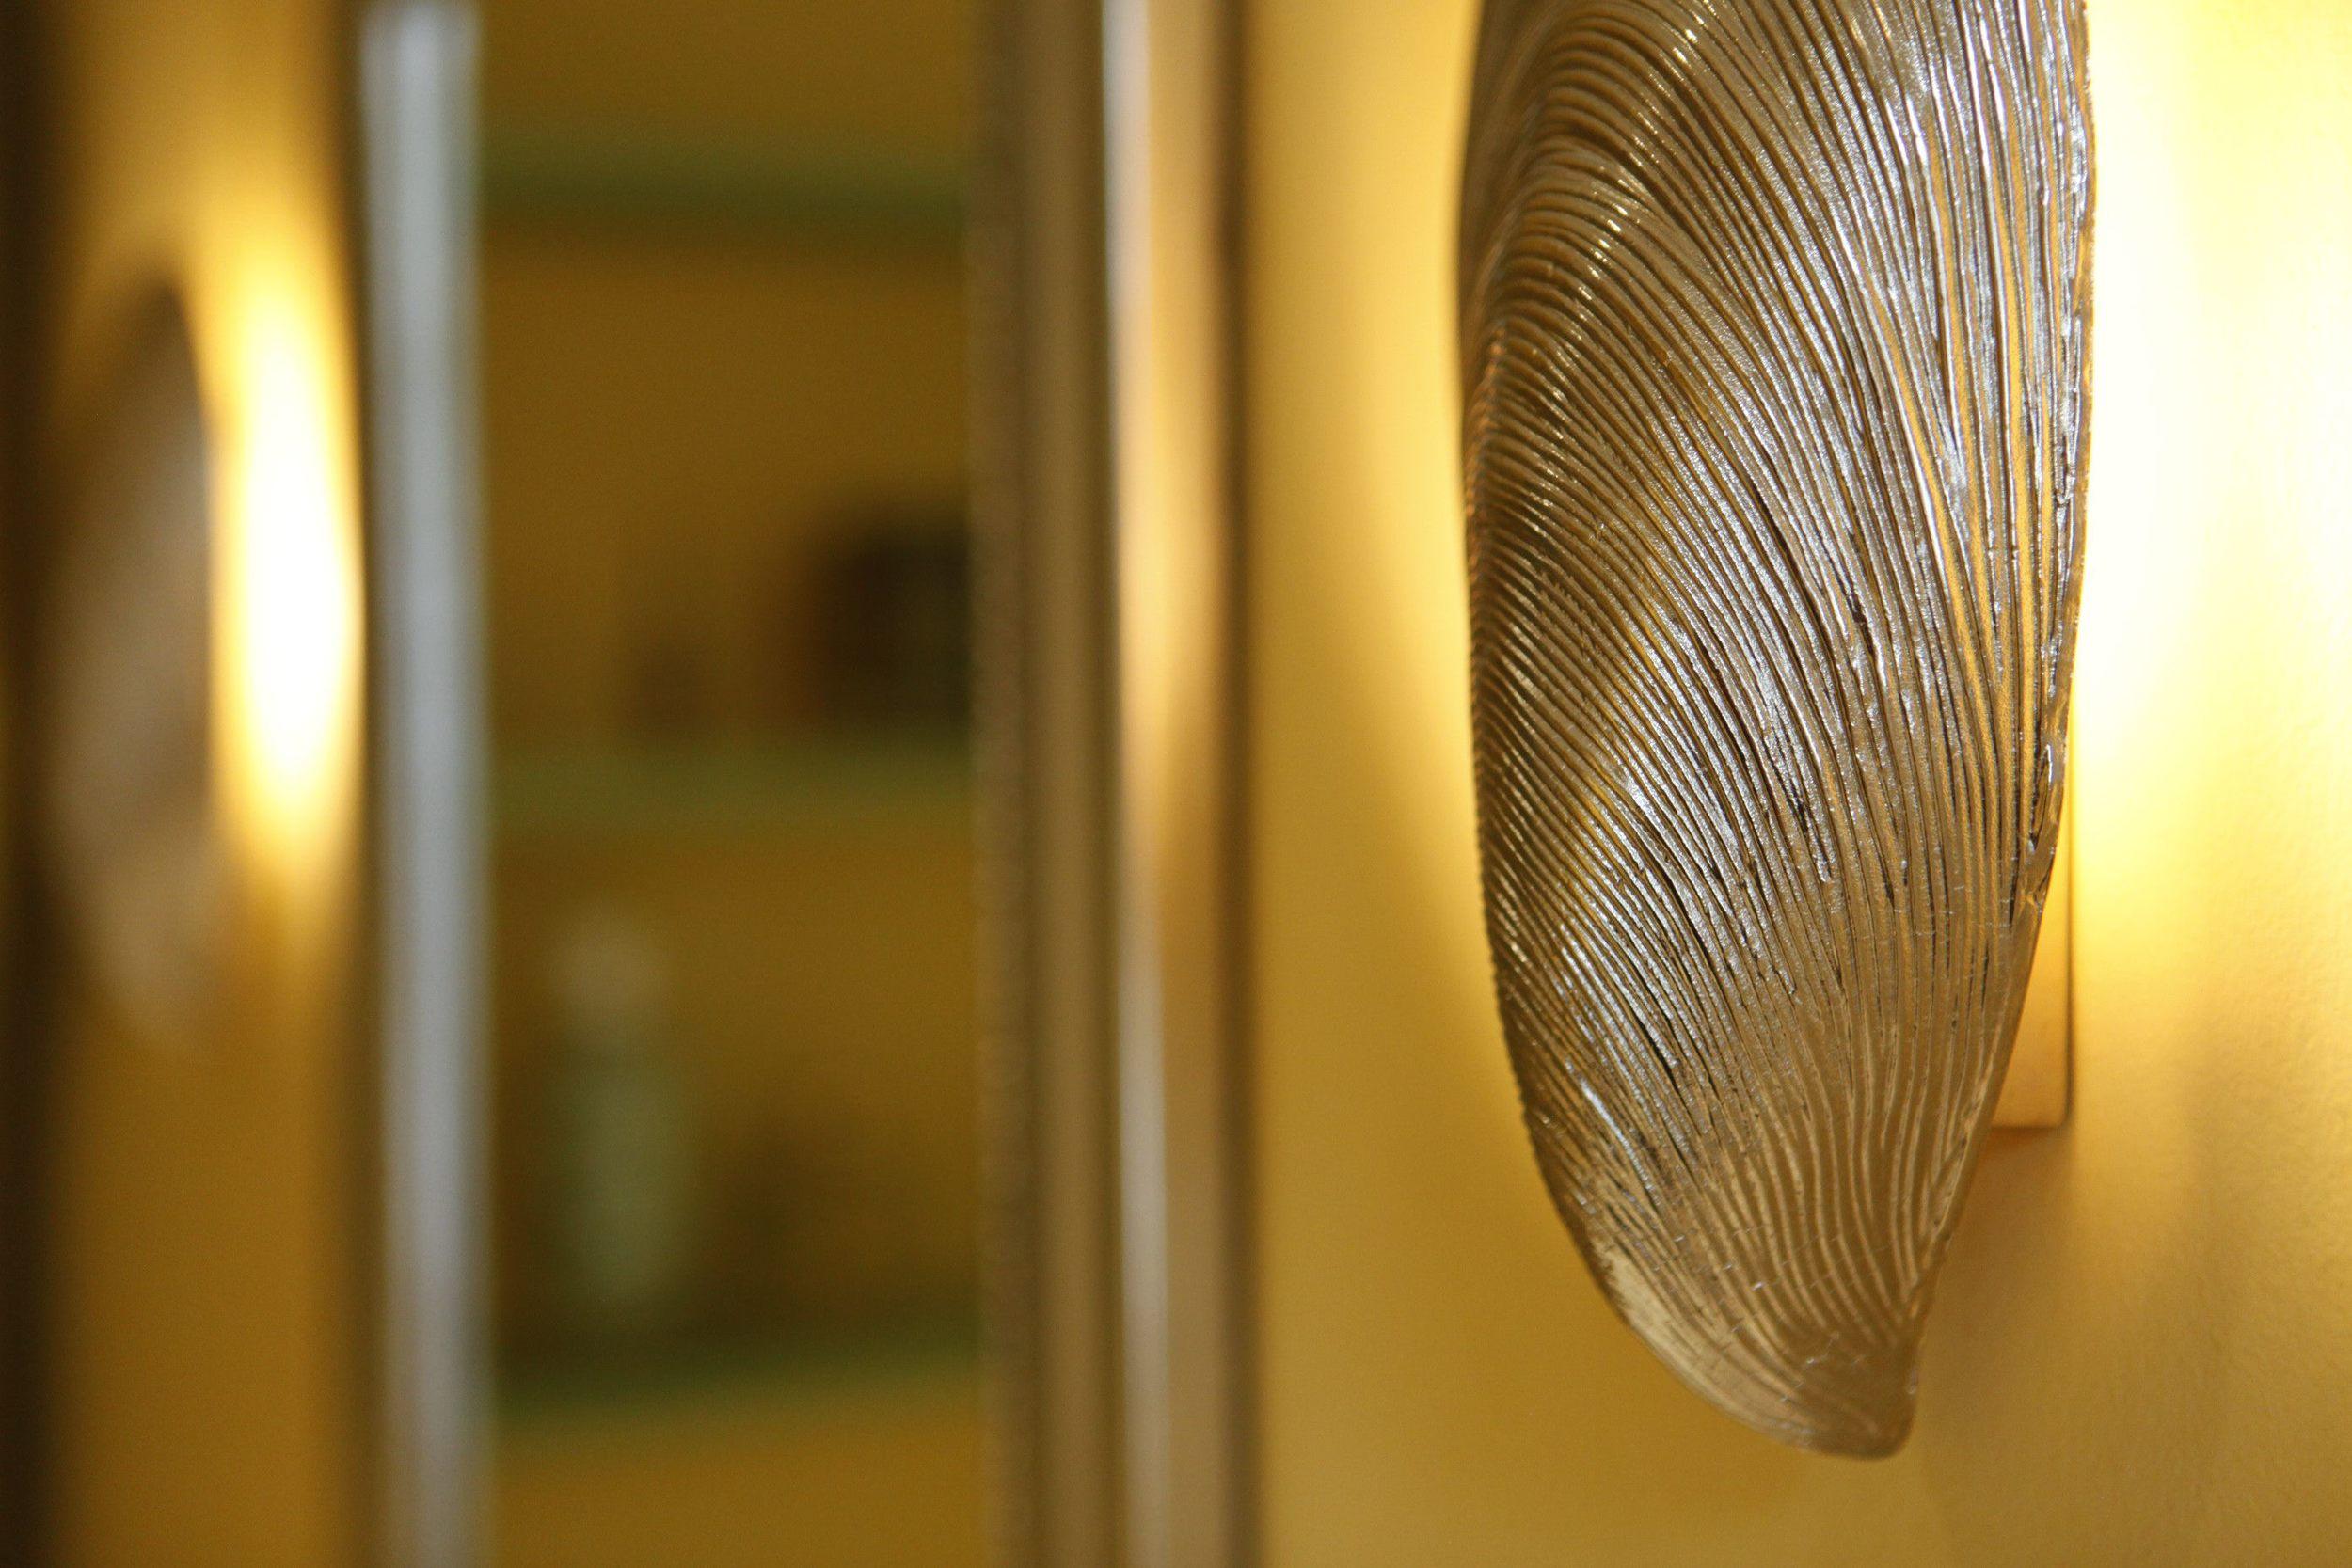 Shell lights create a warm glow around a silver mirror